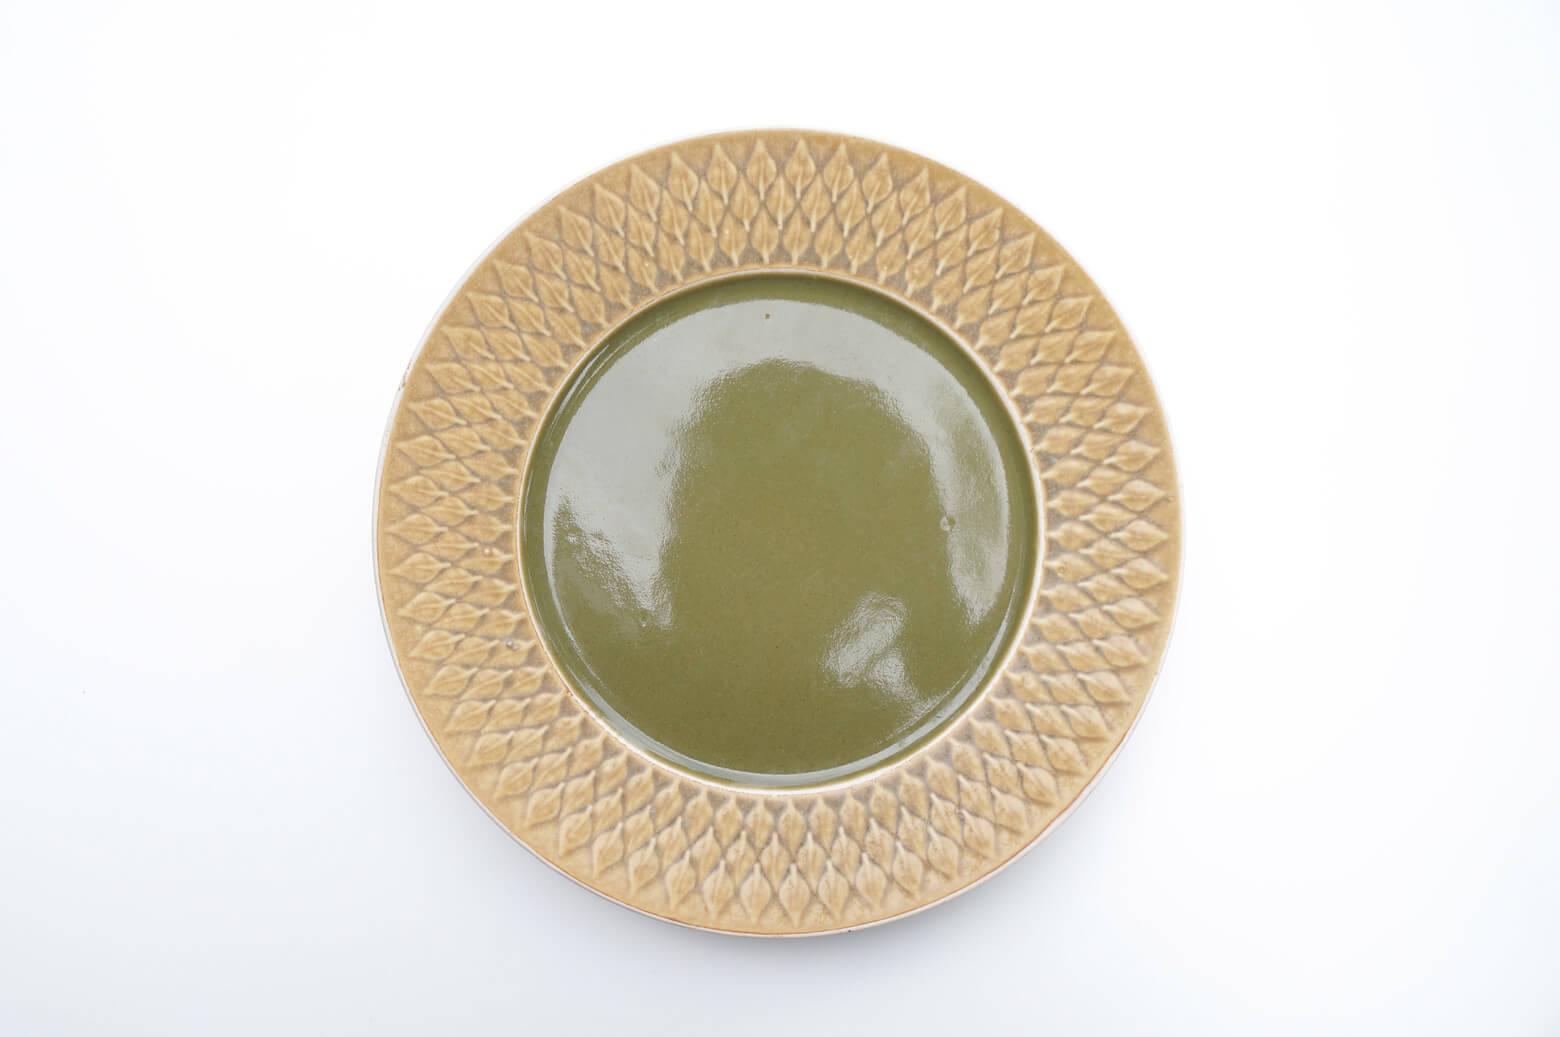 furuichi vintage secondhand kronjyden relief dinner plate 25cm